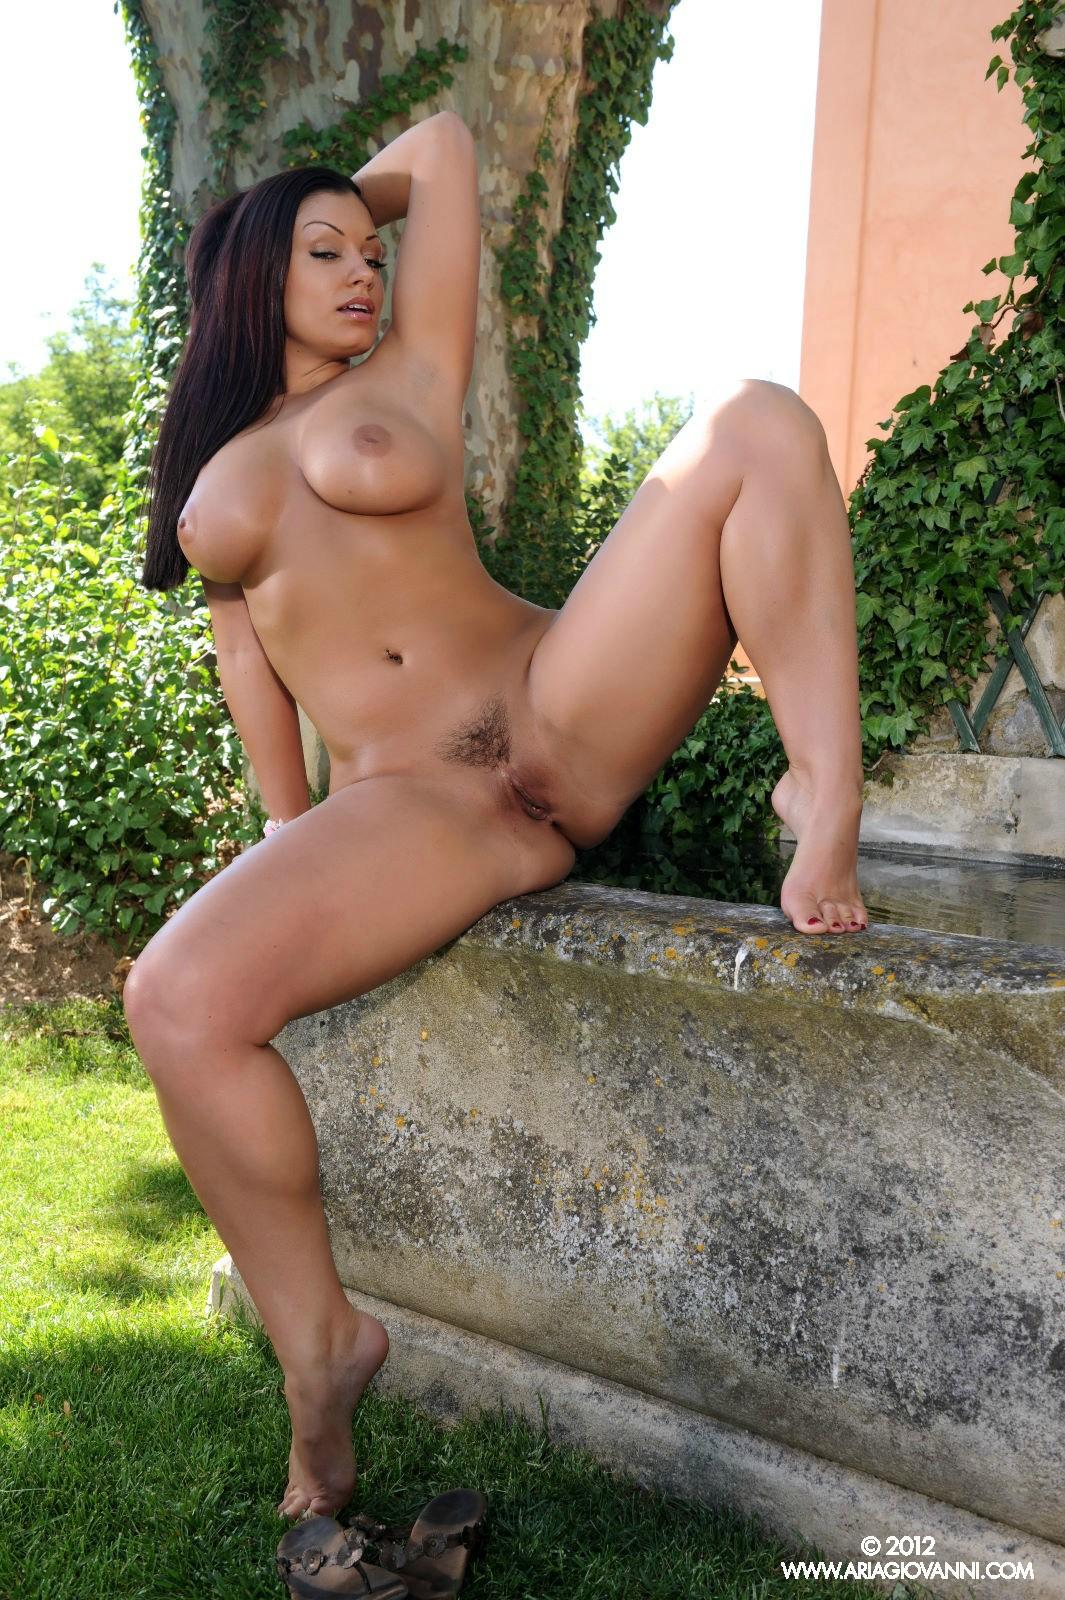 Hot mom nude shower